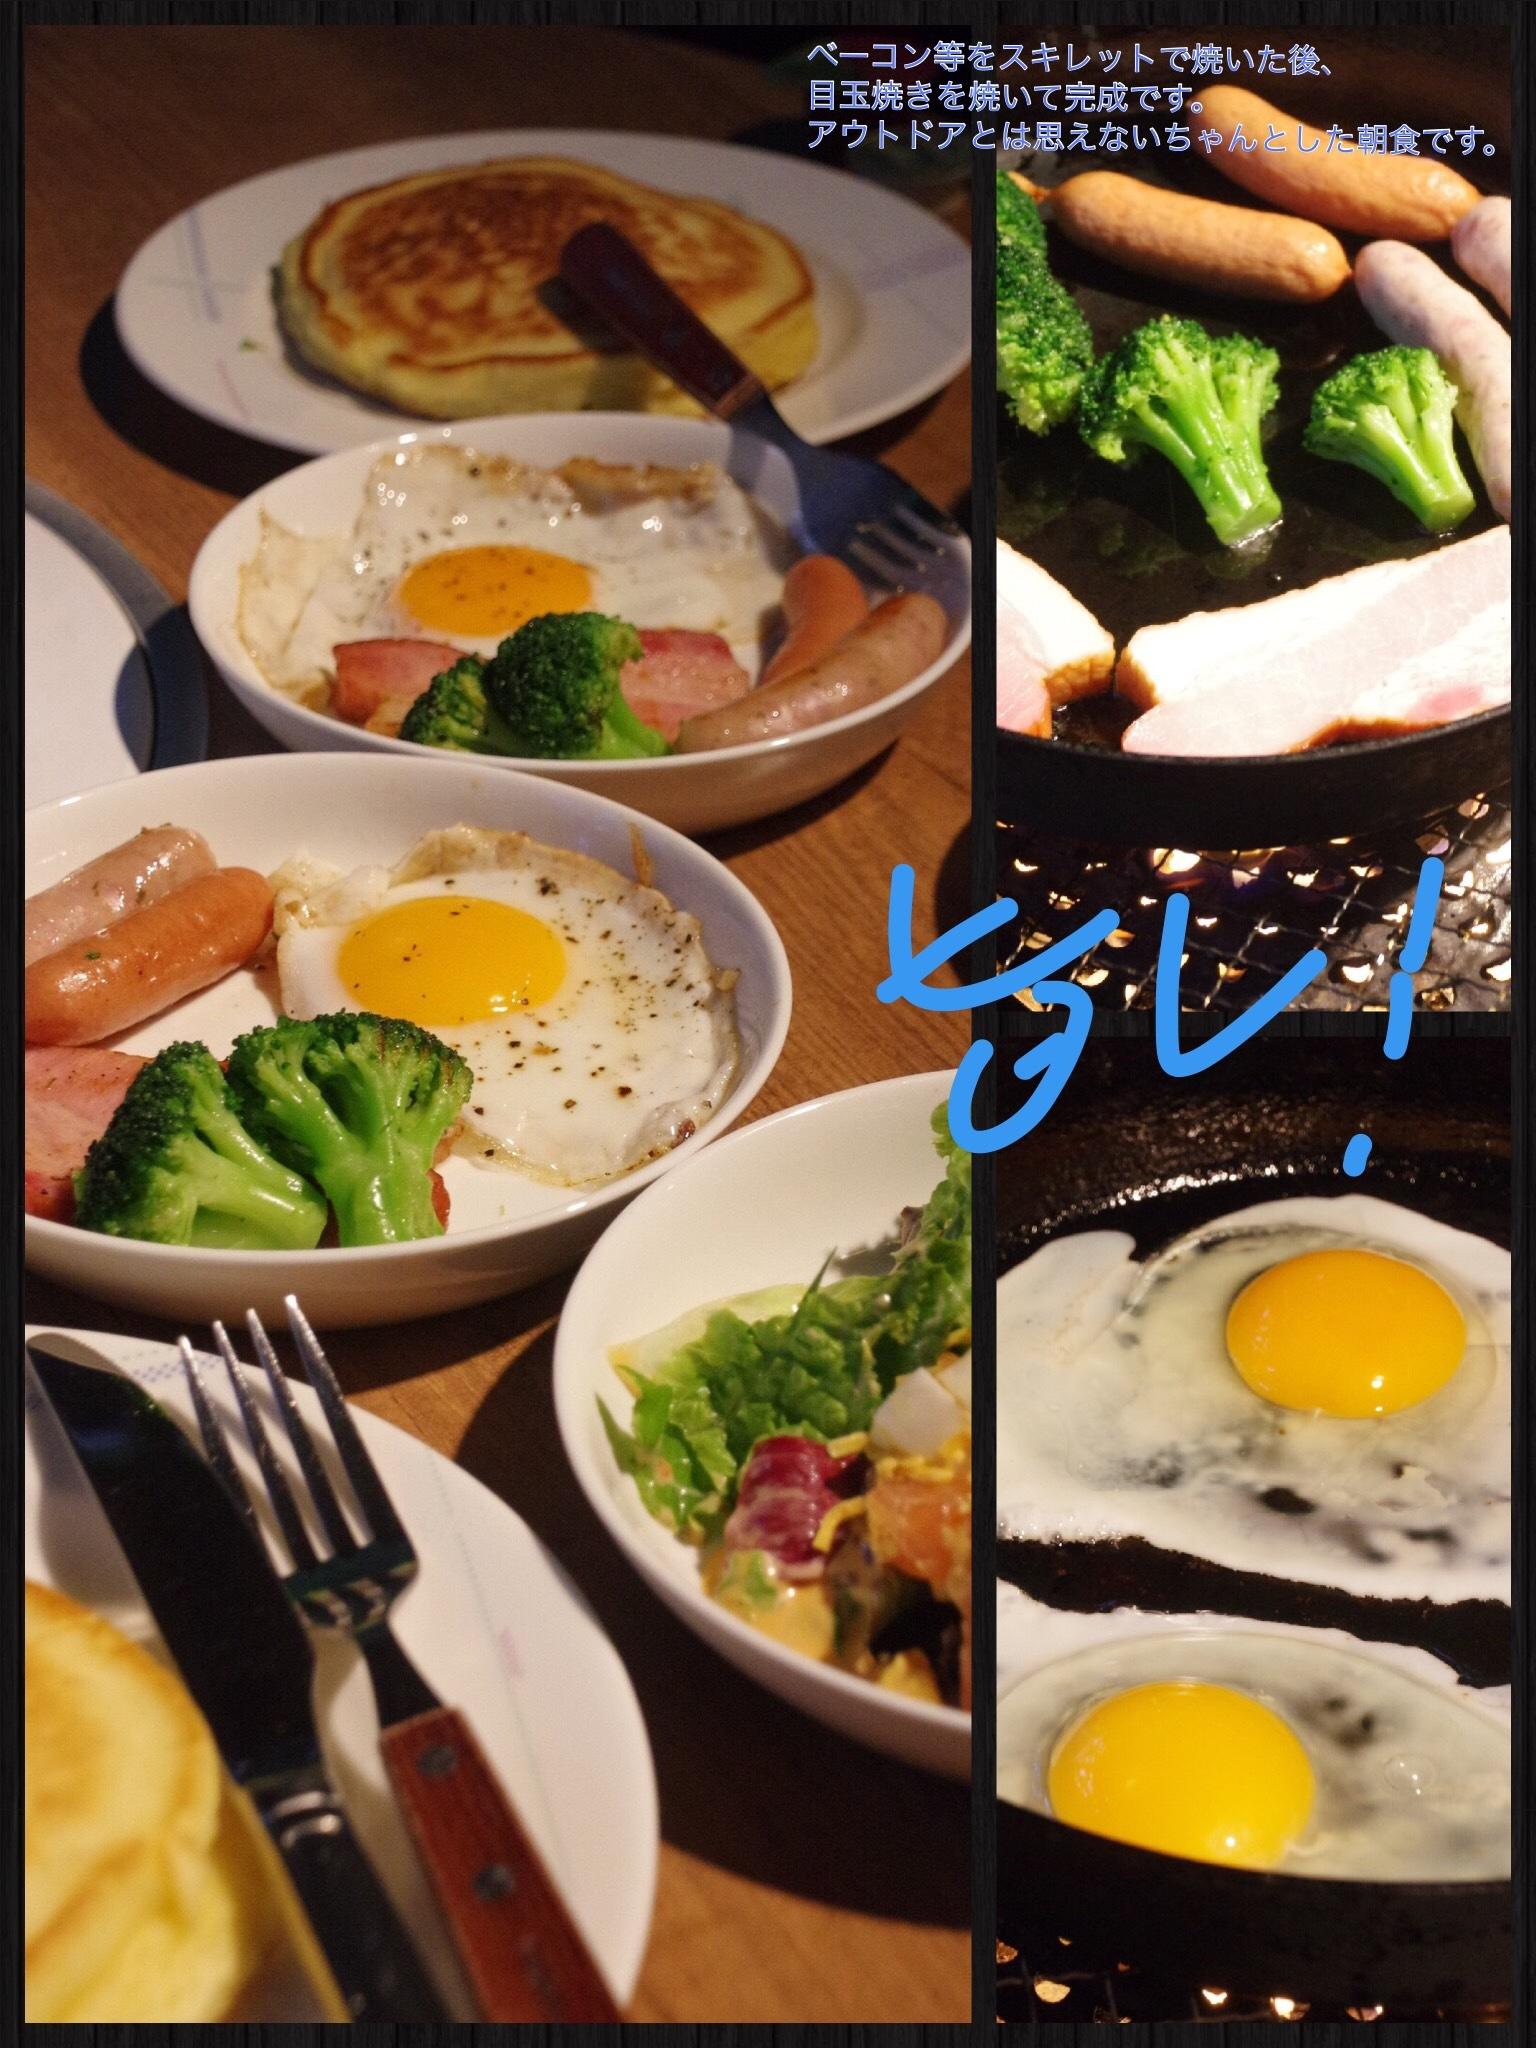 「PICA秩父グランオーベルジュコテージ」宿泊記 朝食